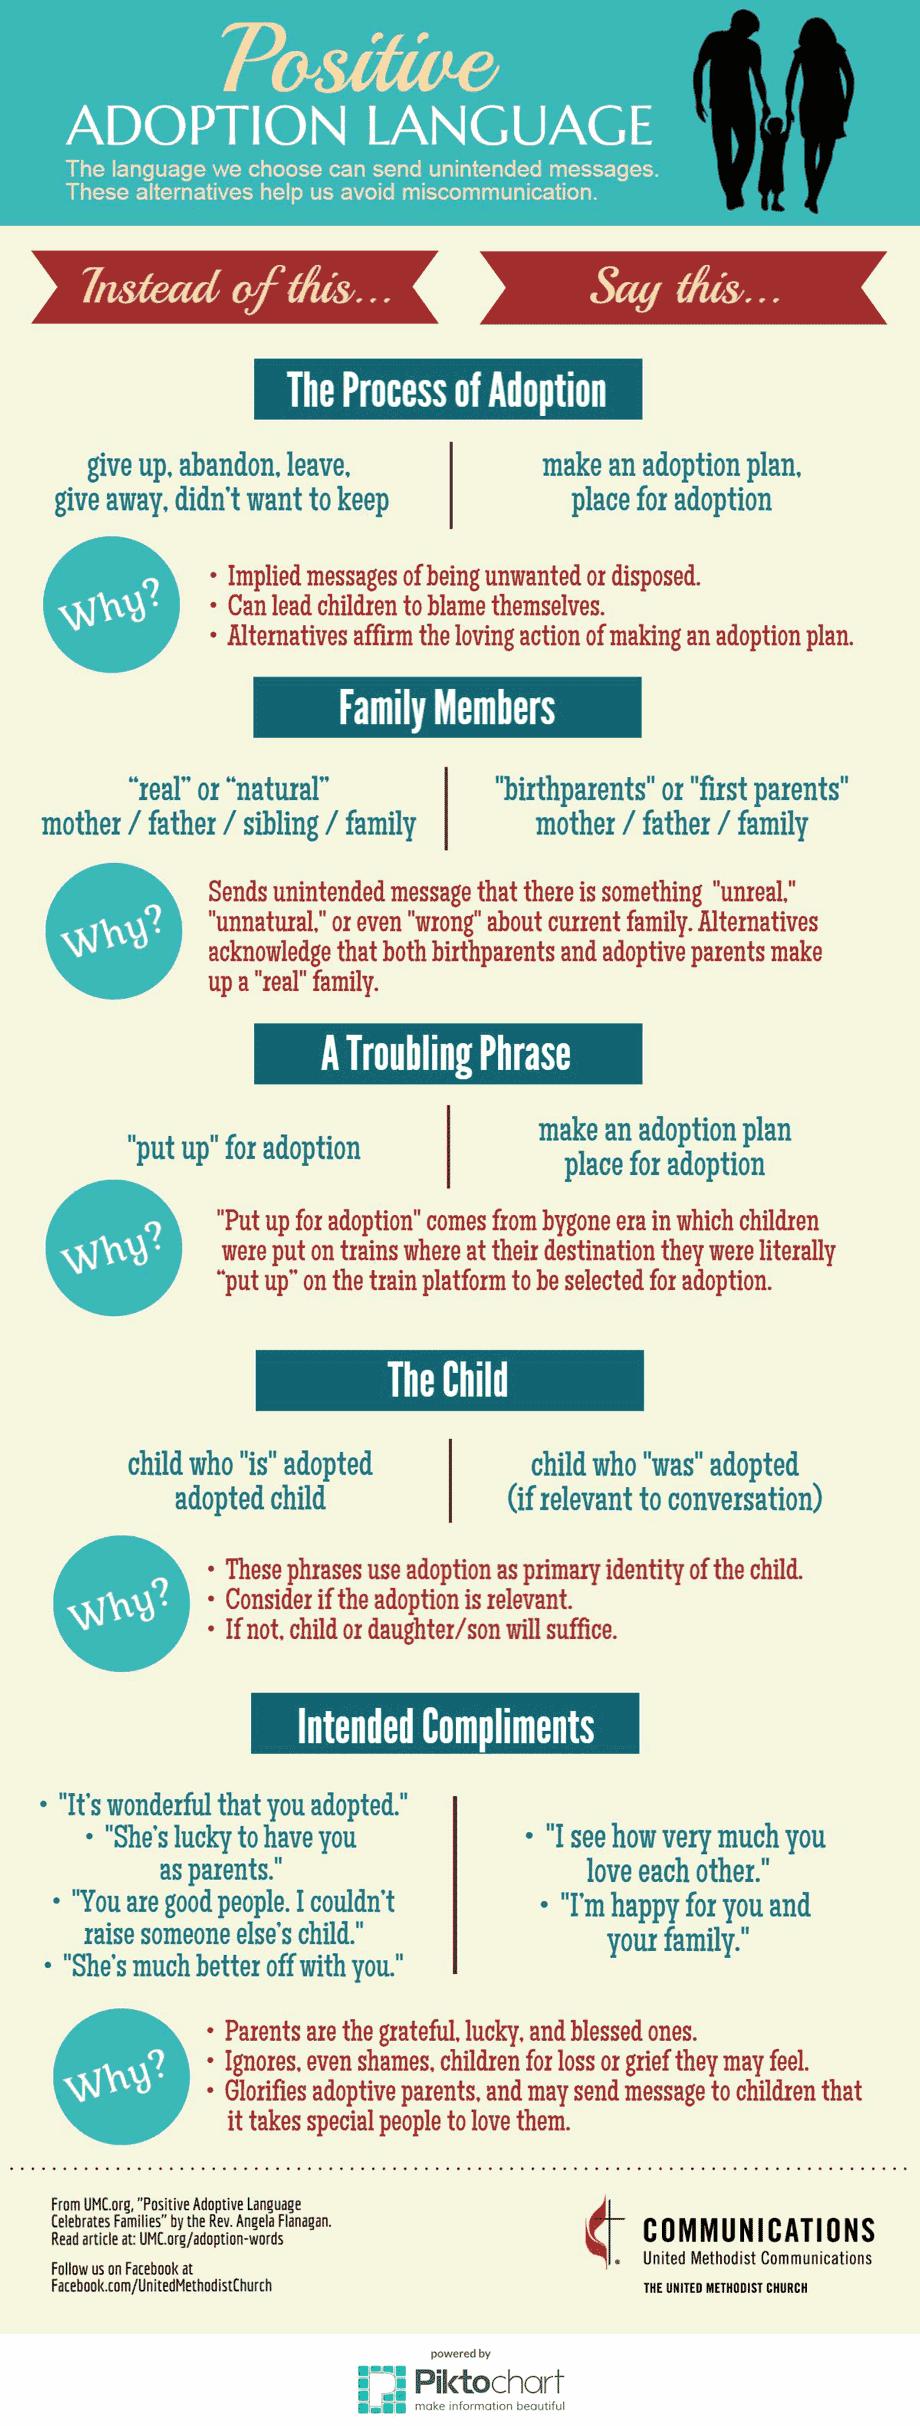 positive-adoption-language-infographic-920.png